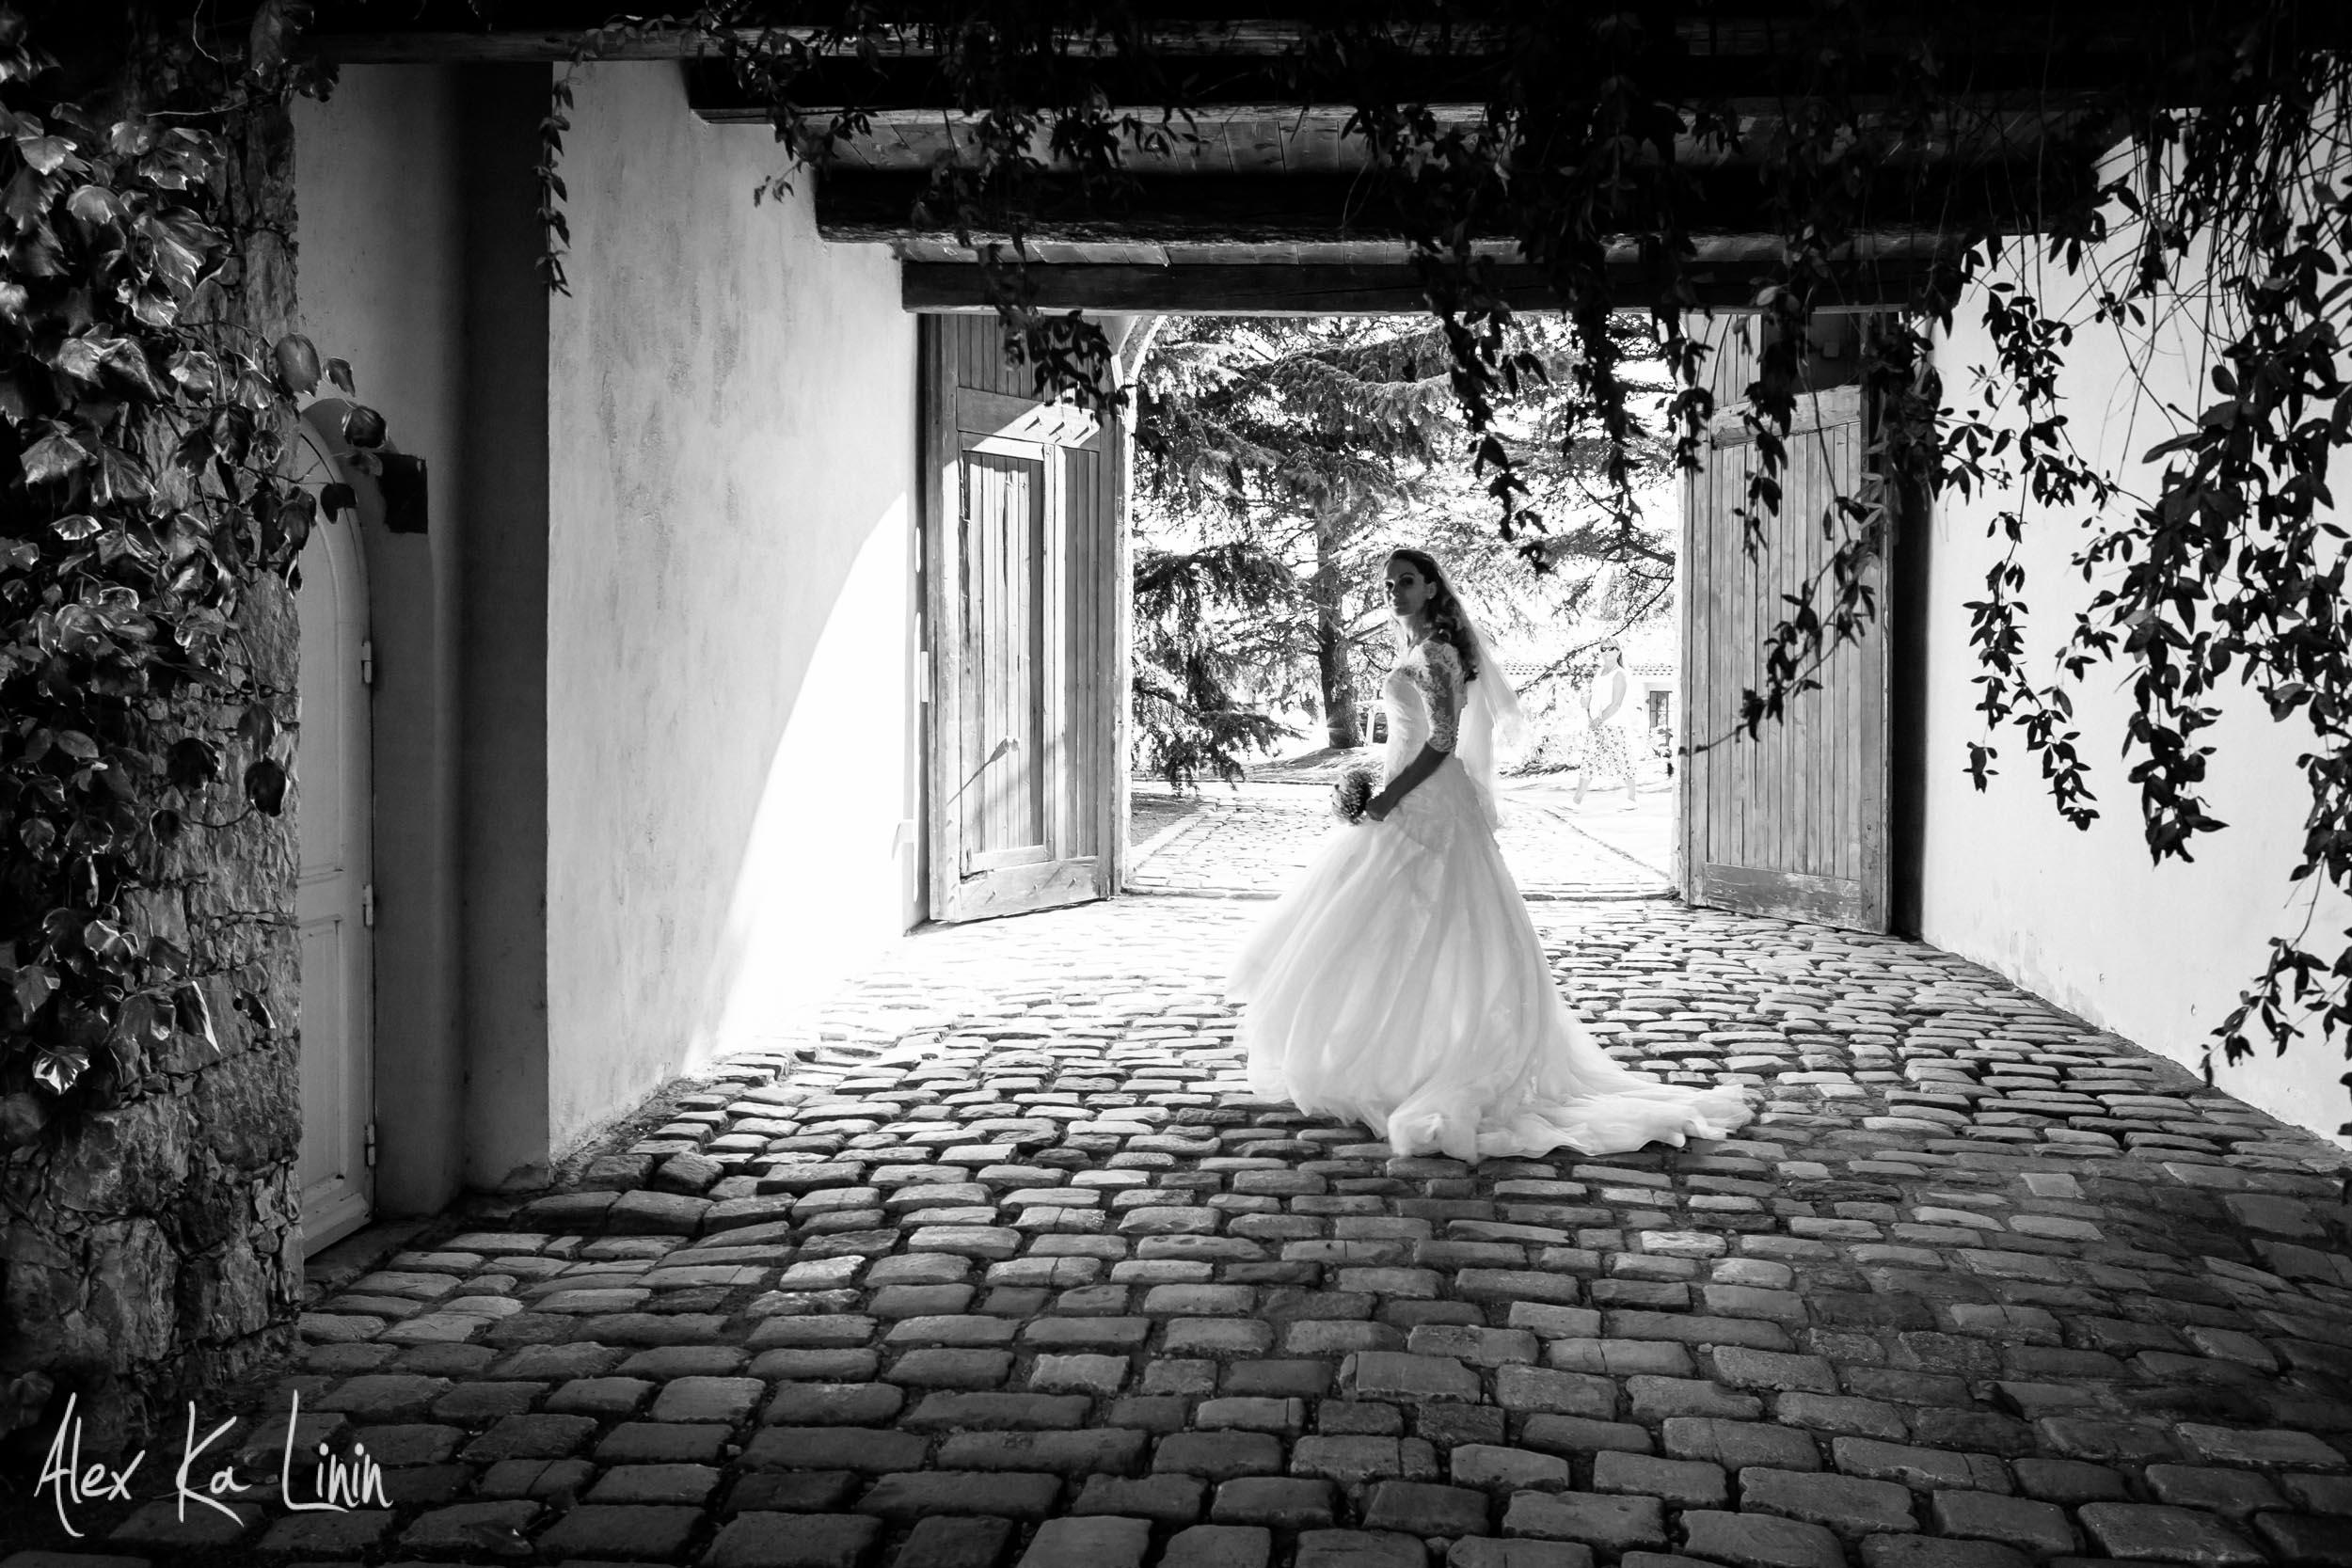 AlexKa_wedding_mariage_photographer-36.jpg